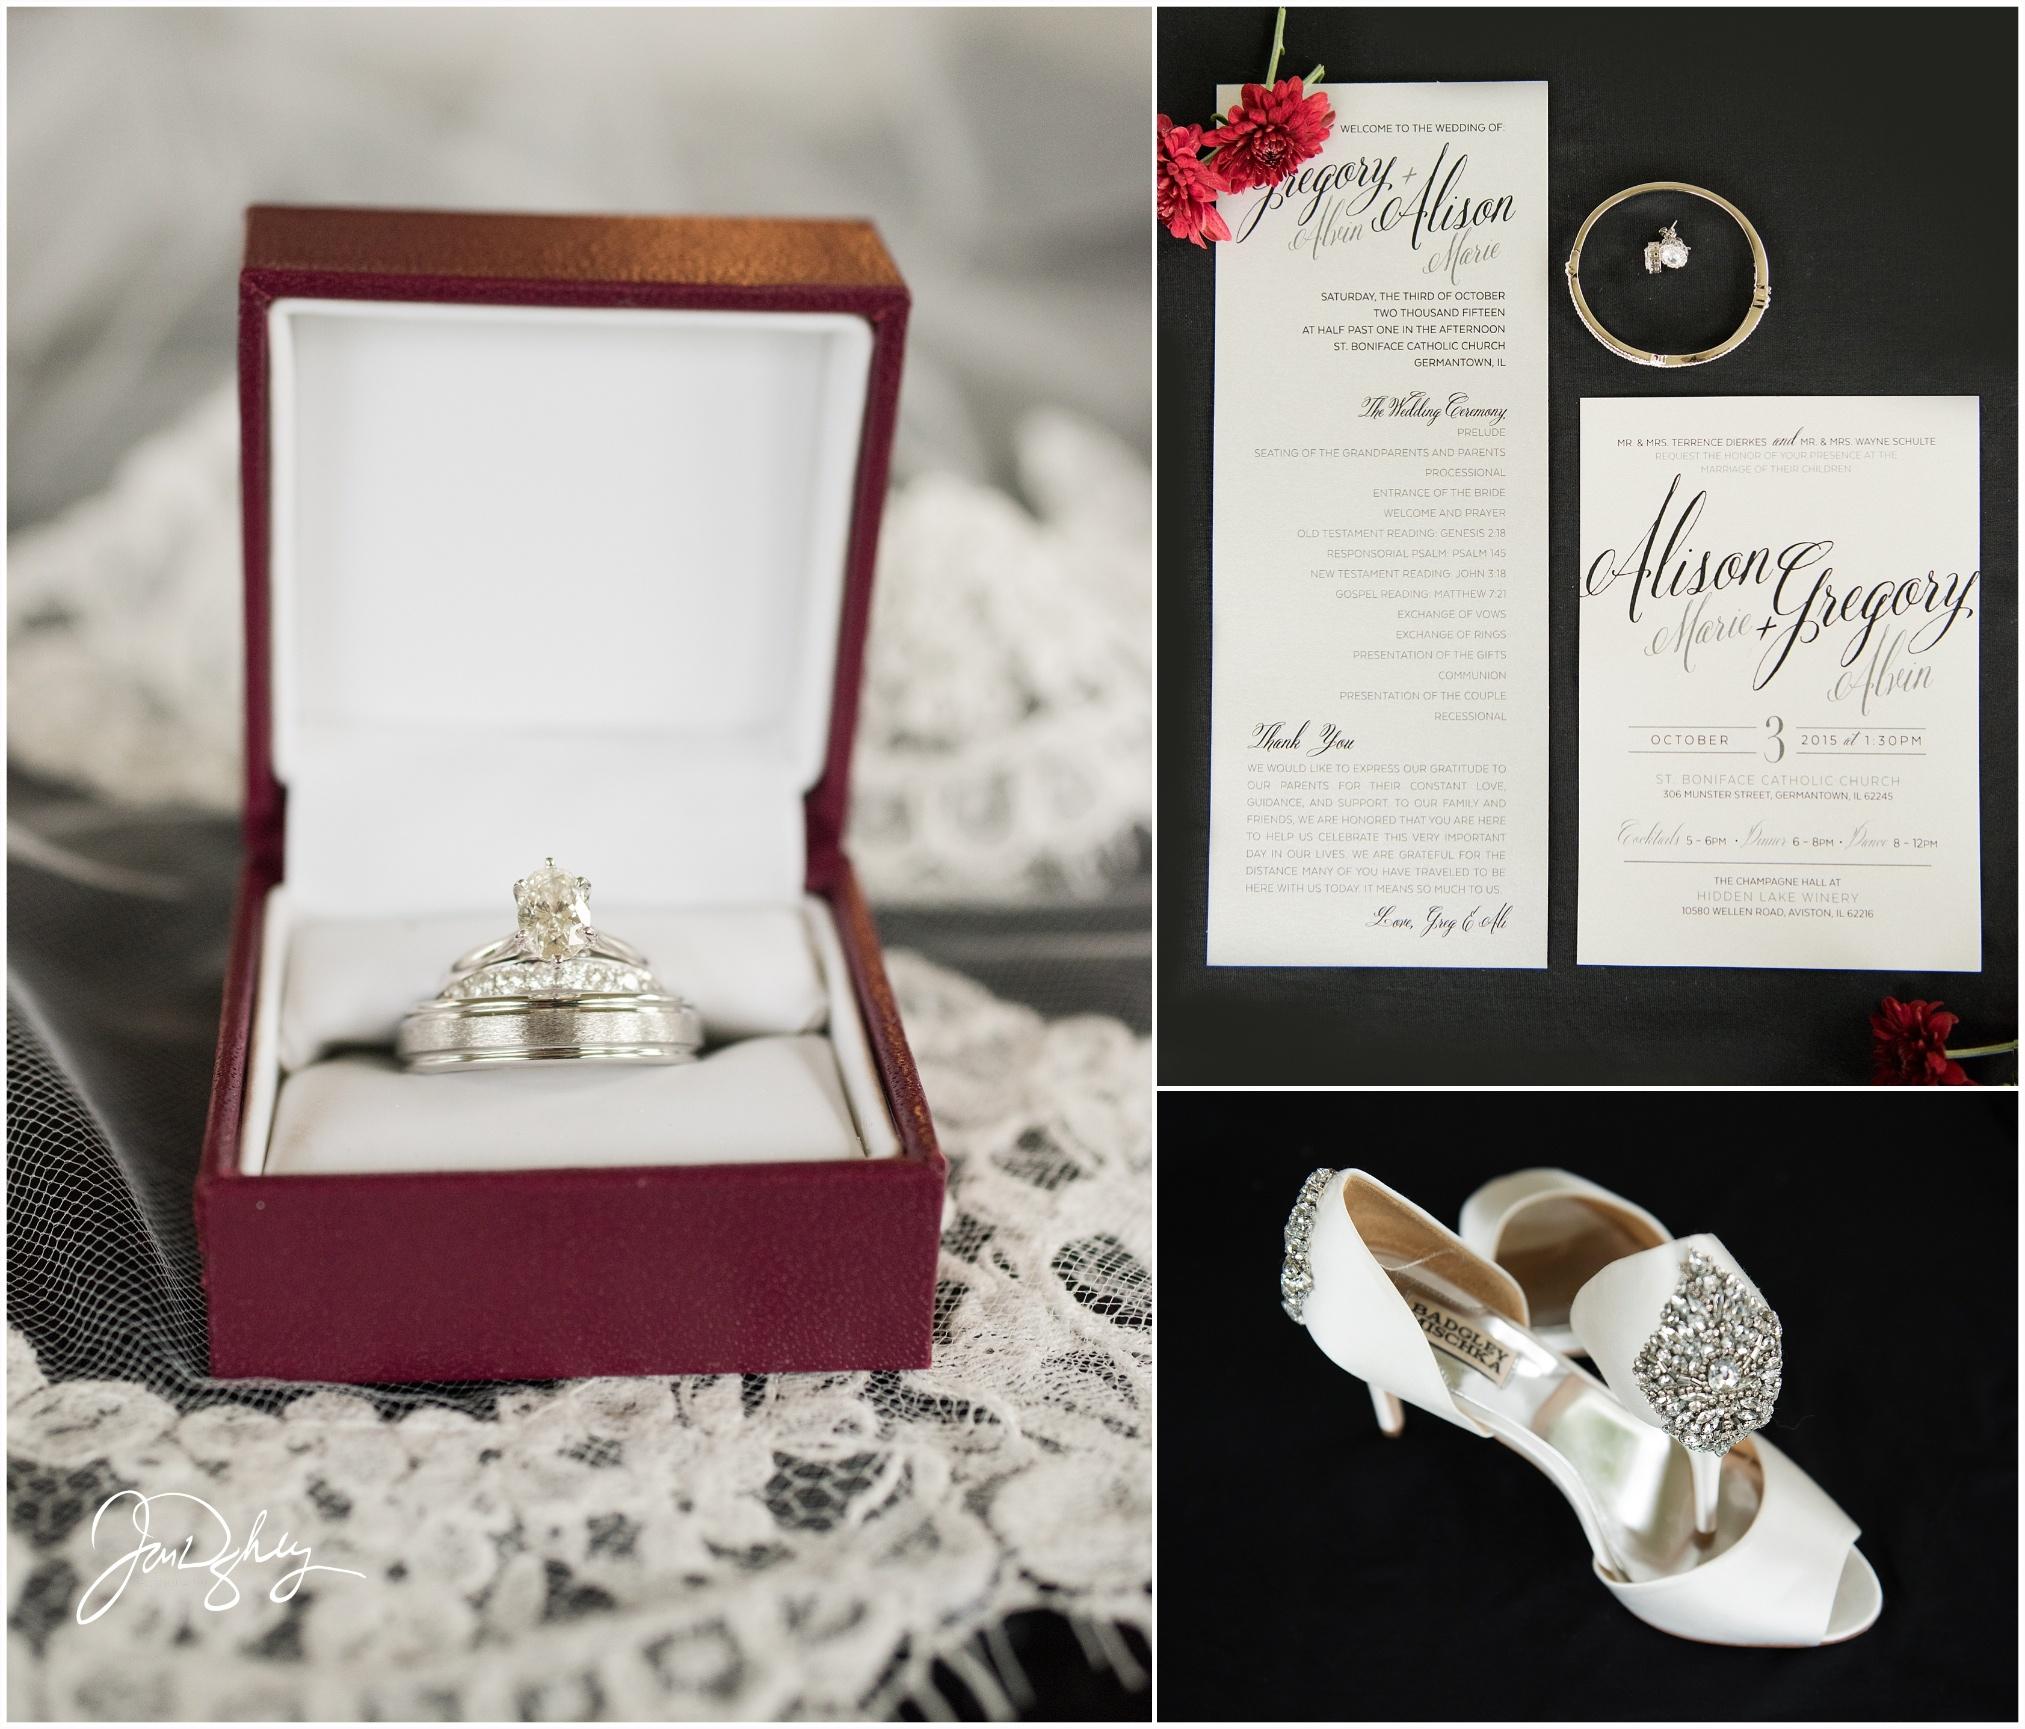 Illinois clinton county aviston - Enjoy Your Sneak Peek Tags Southern Il Wedding Photographer Clinton County